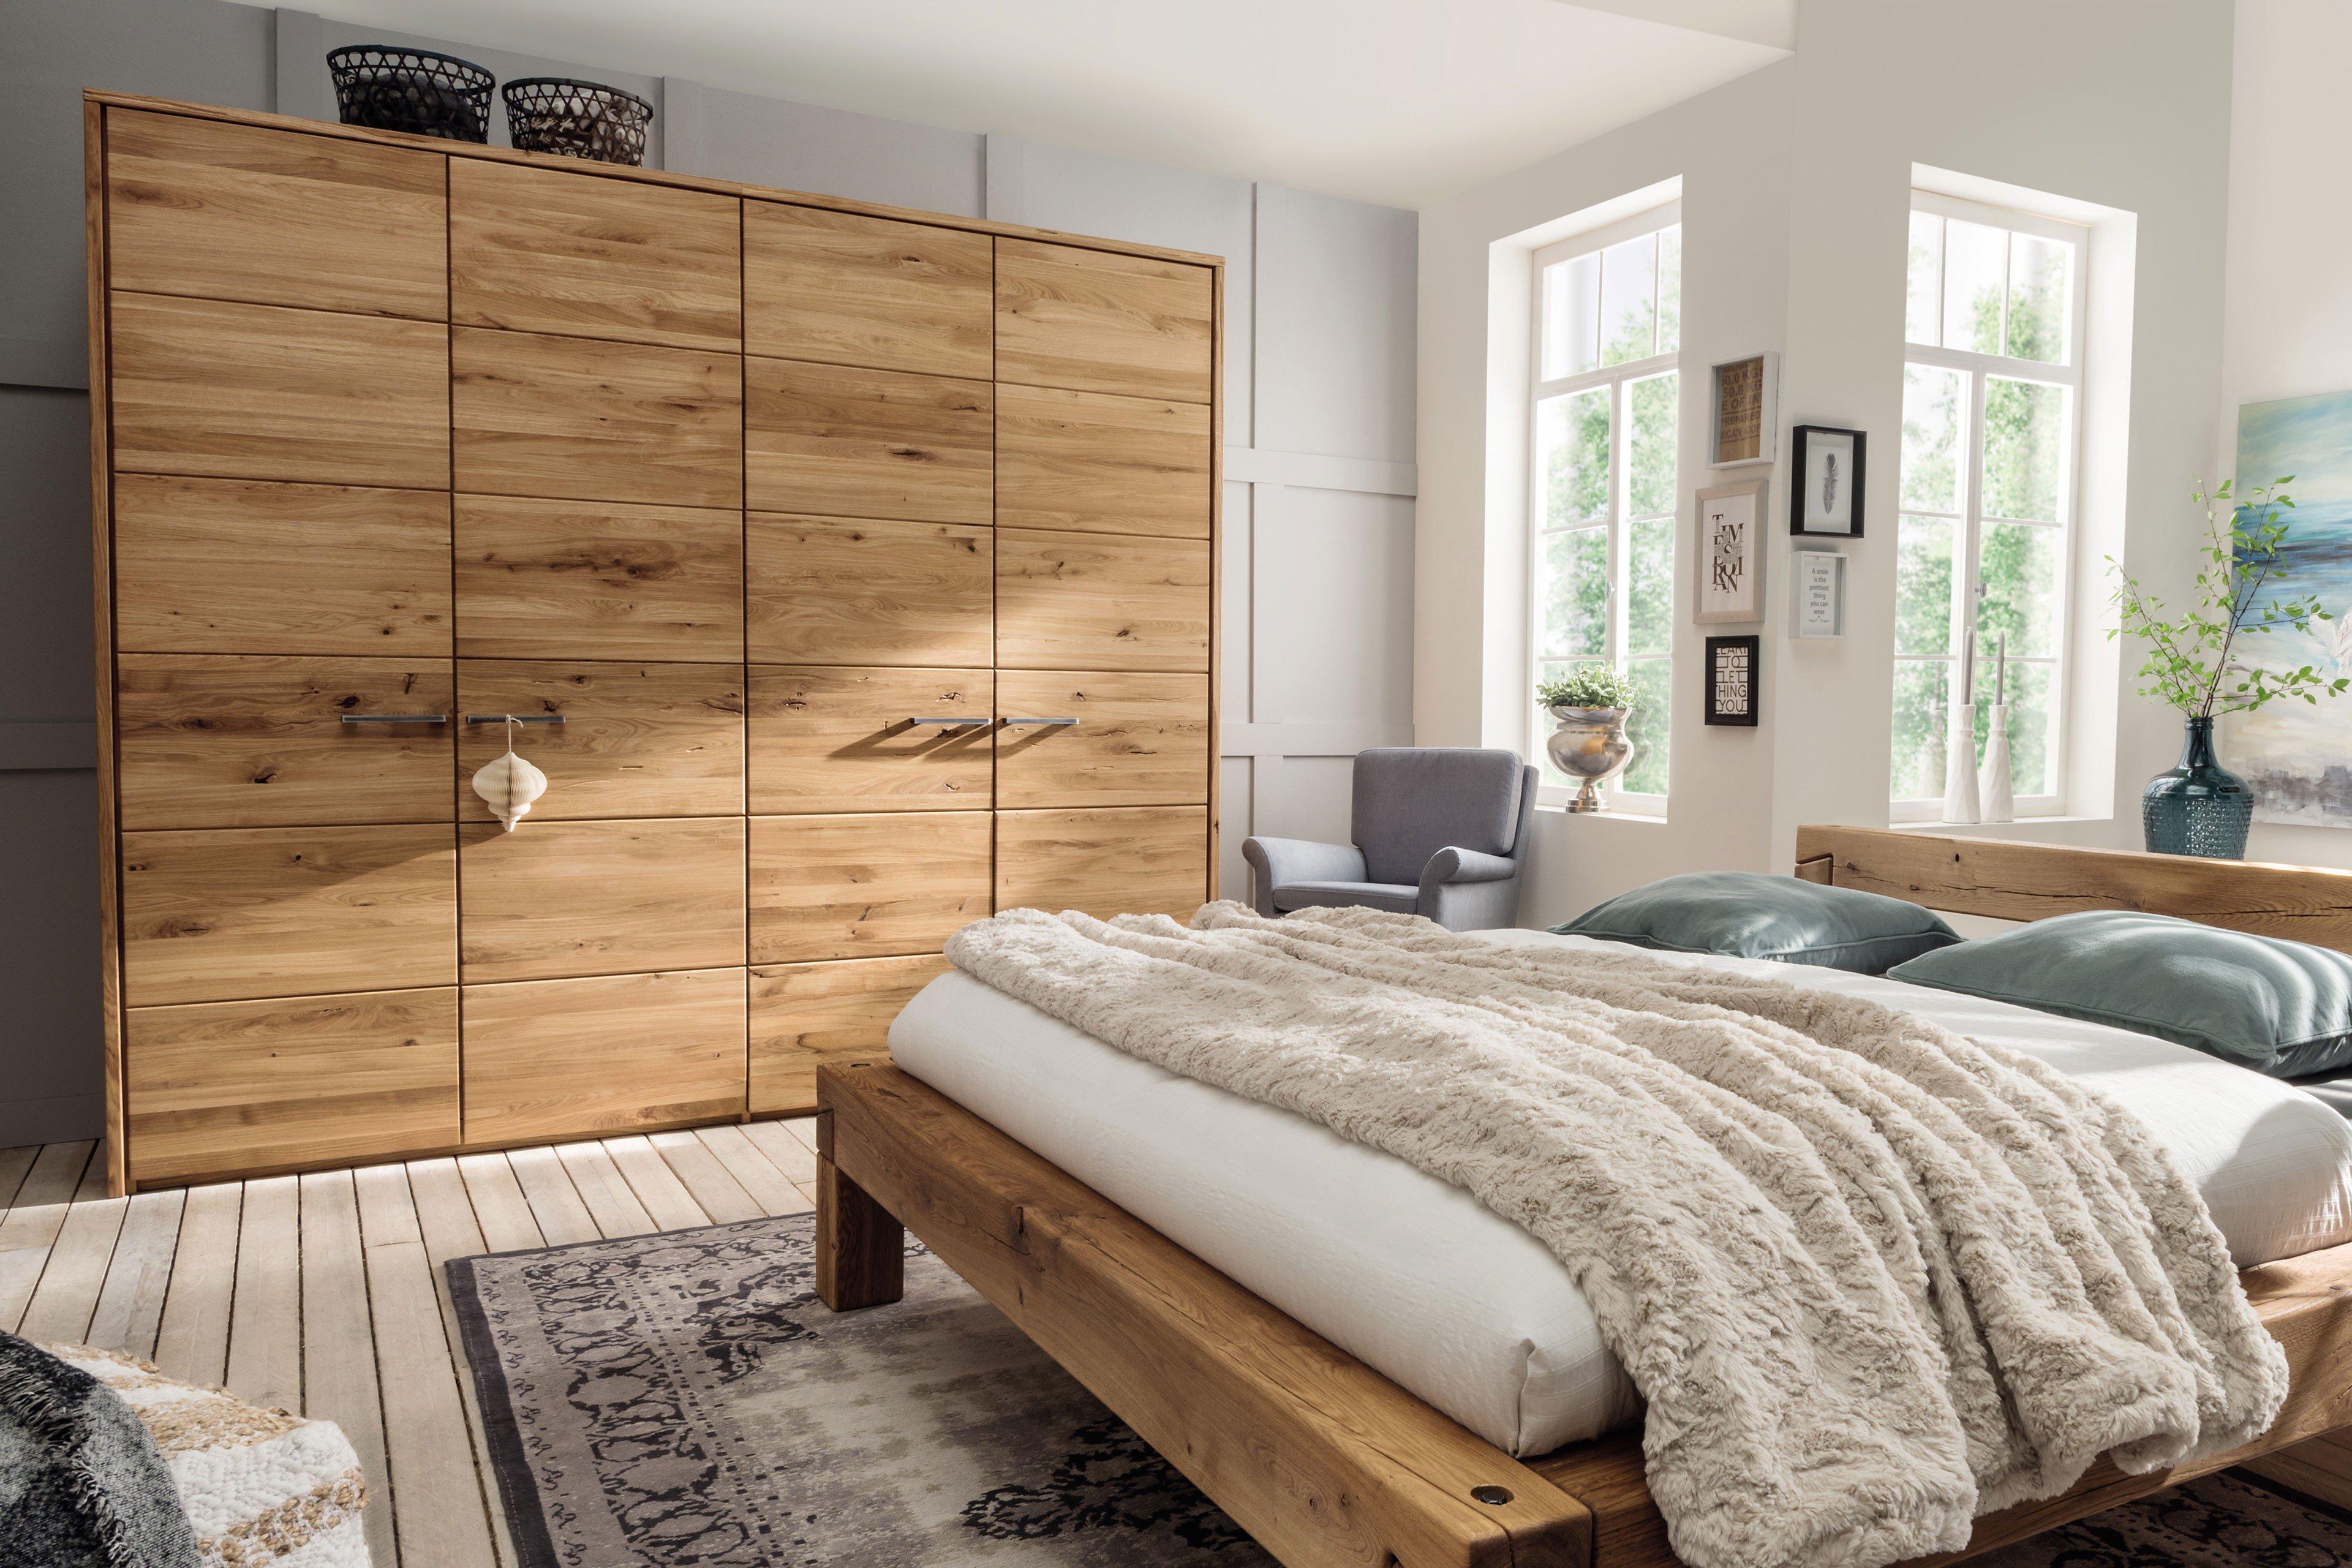 schrank system great with schrank system elegant photo. Black Bedroom Furniture Sets. Home Design Ideas